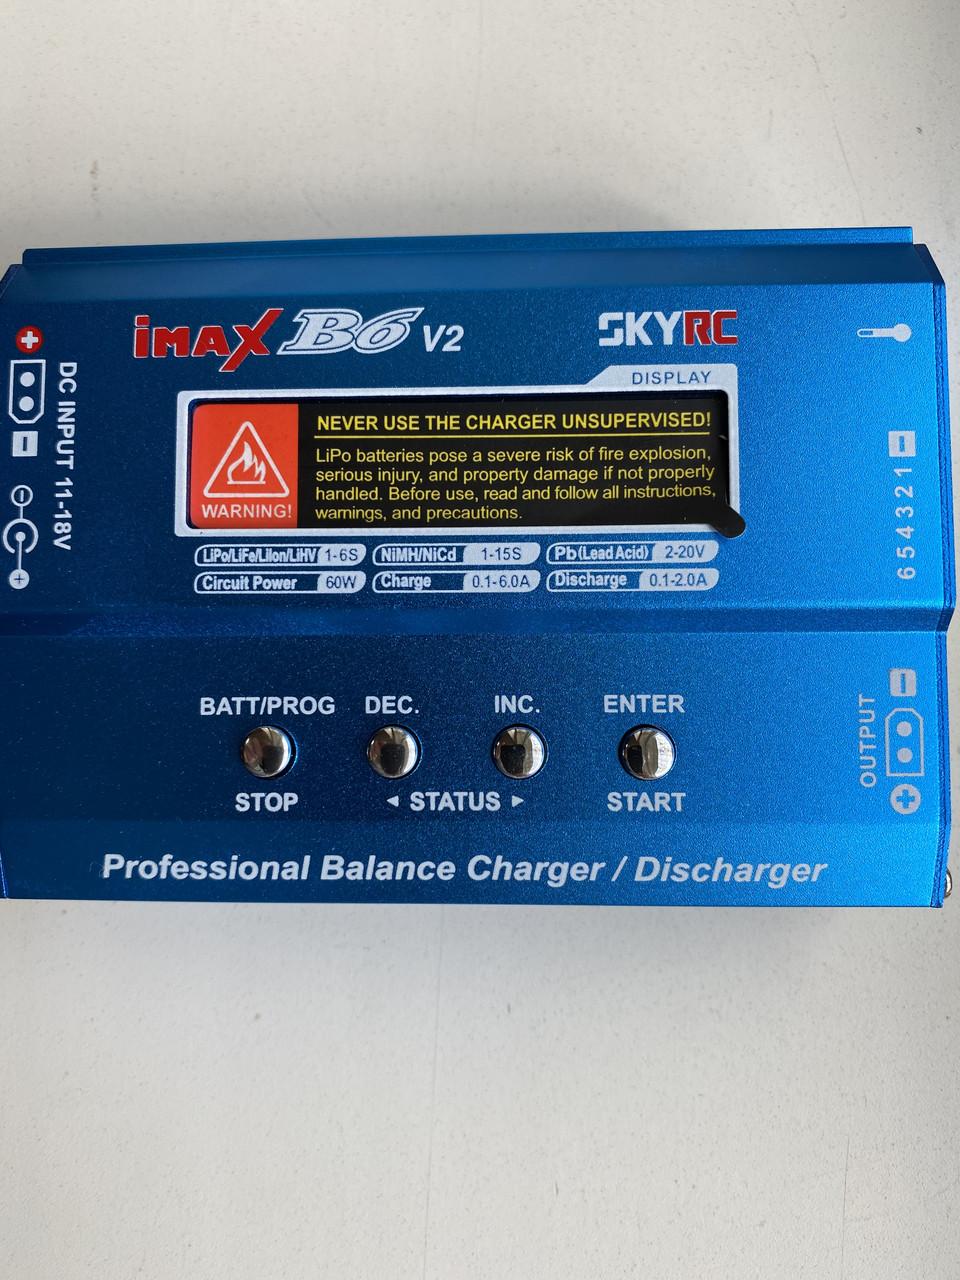 Зарядное устройство IMAX B6 V2 SKYRC, новая модель , оригинал